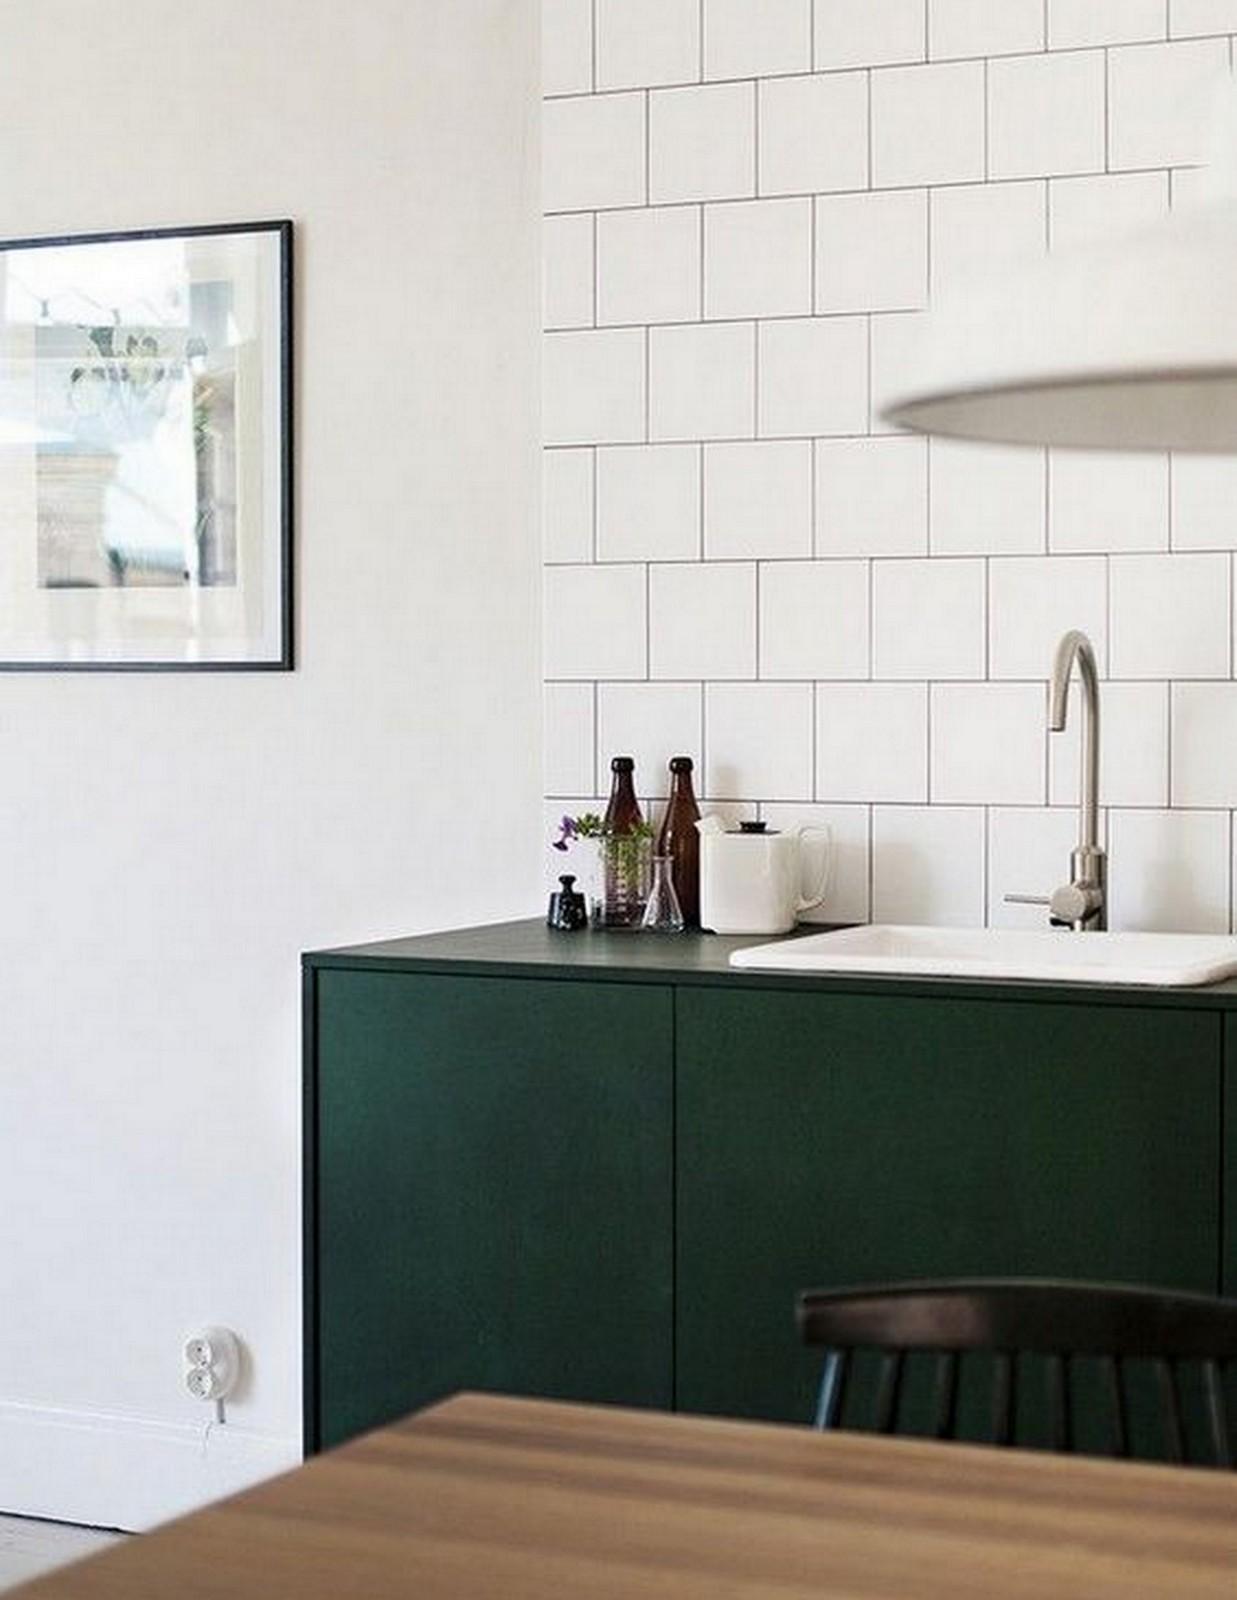 Forrest Green Kitchen | House of Valentina